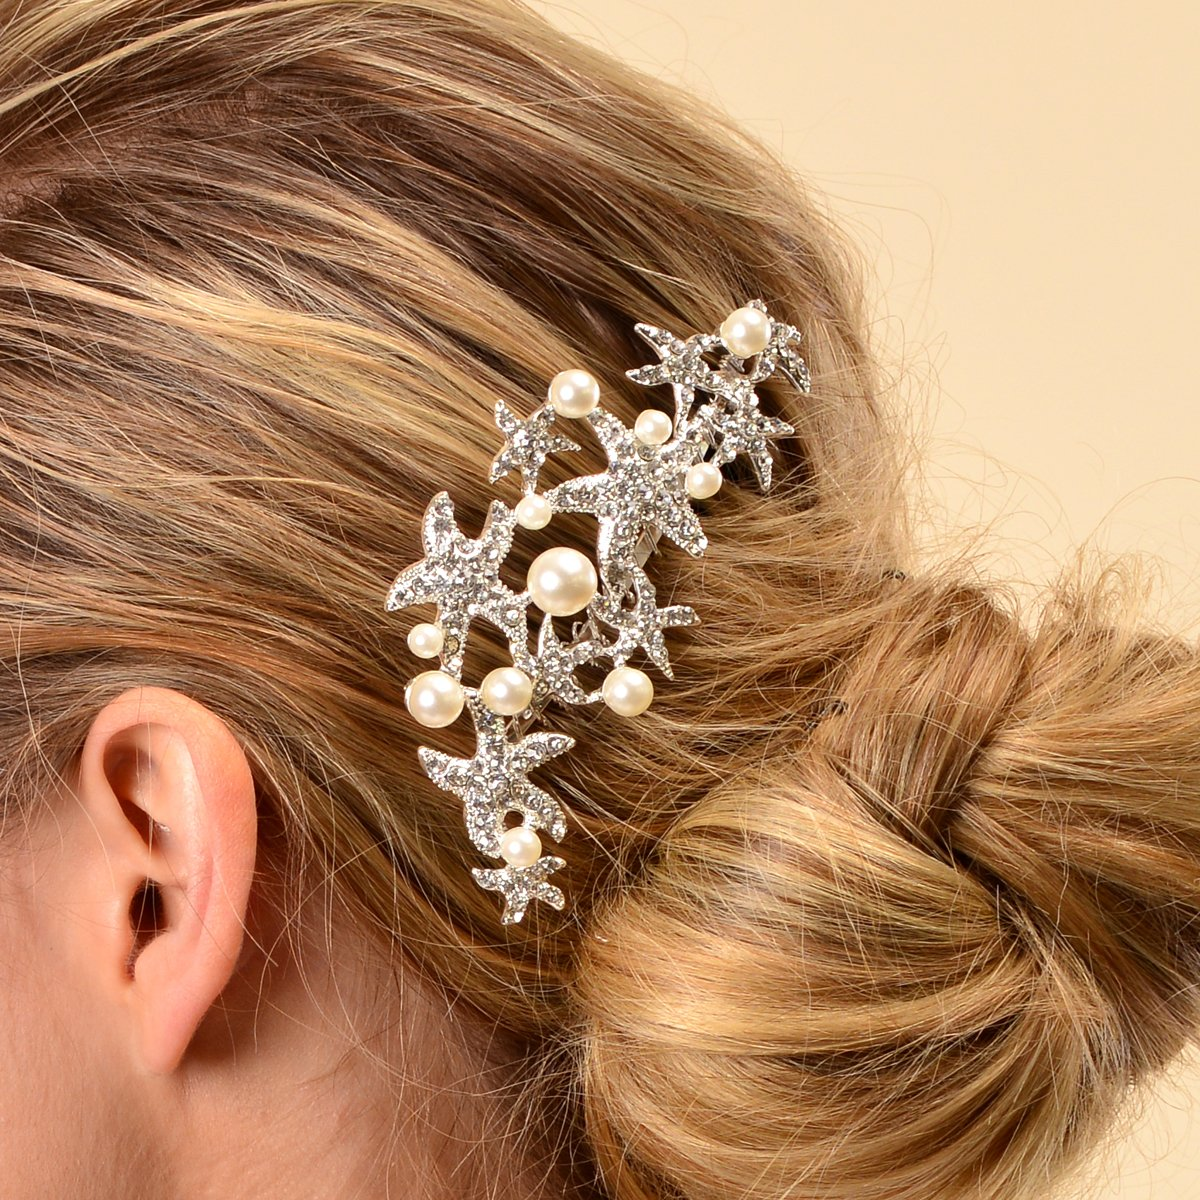 Remedios Starfish Wedding Comb Prom Bridal Bridesmaid Crystal Hairpiece Accessory